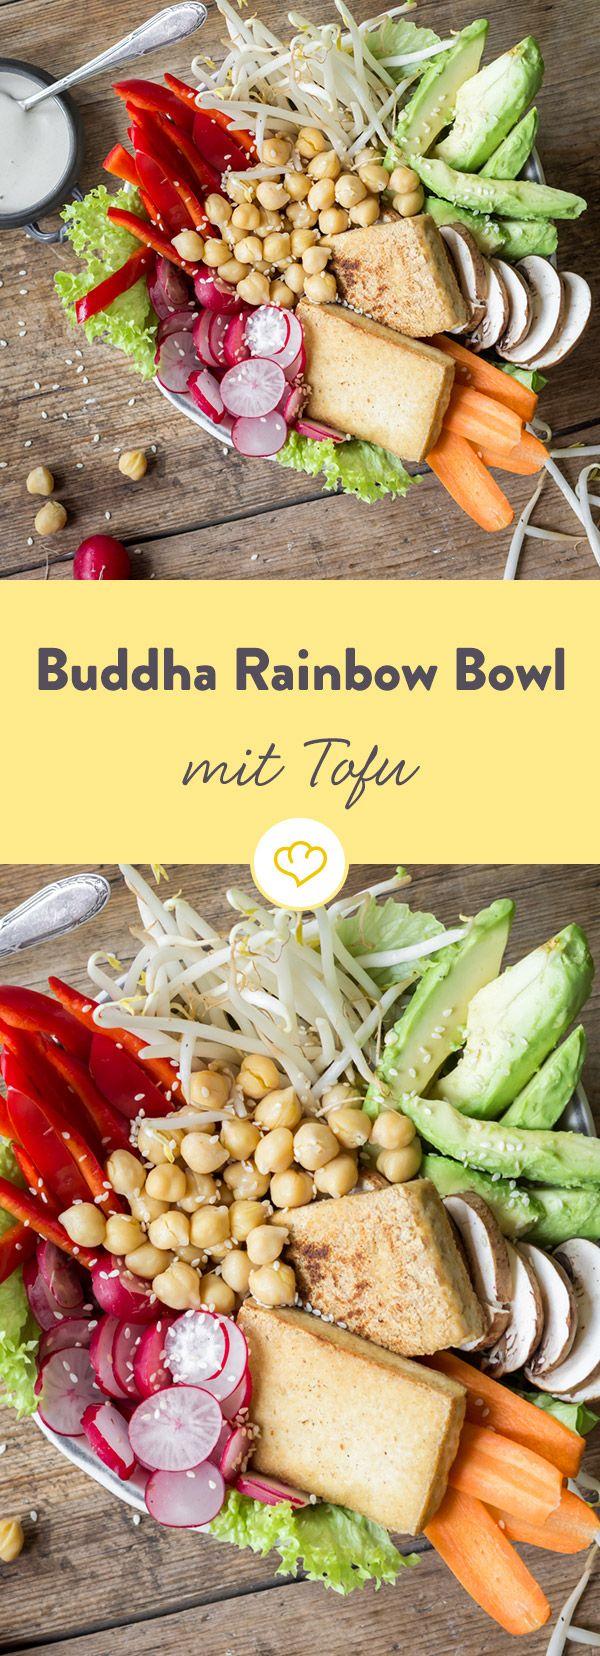 Buddha Rainbow Bowl mit gebratenem Tofu #friedtofu